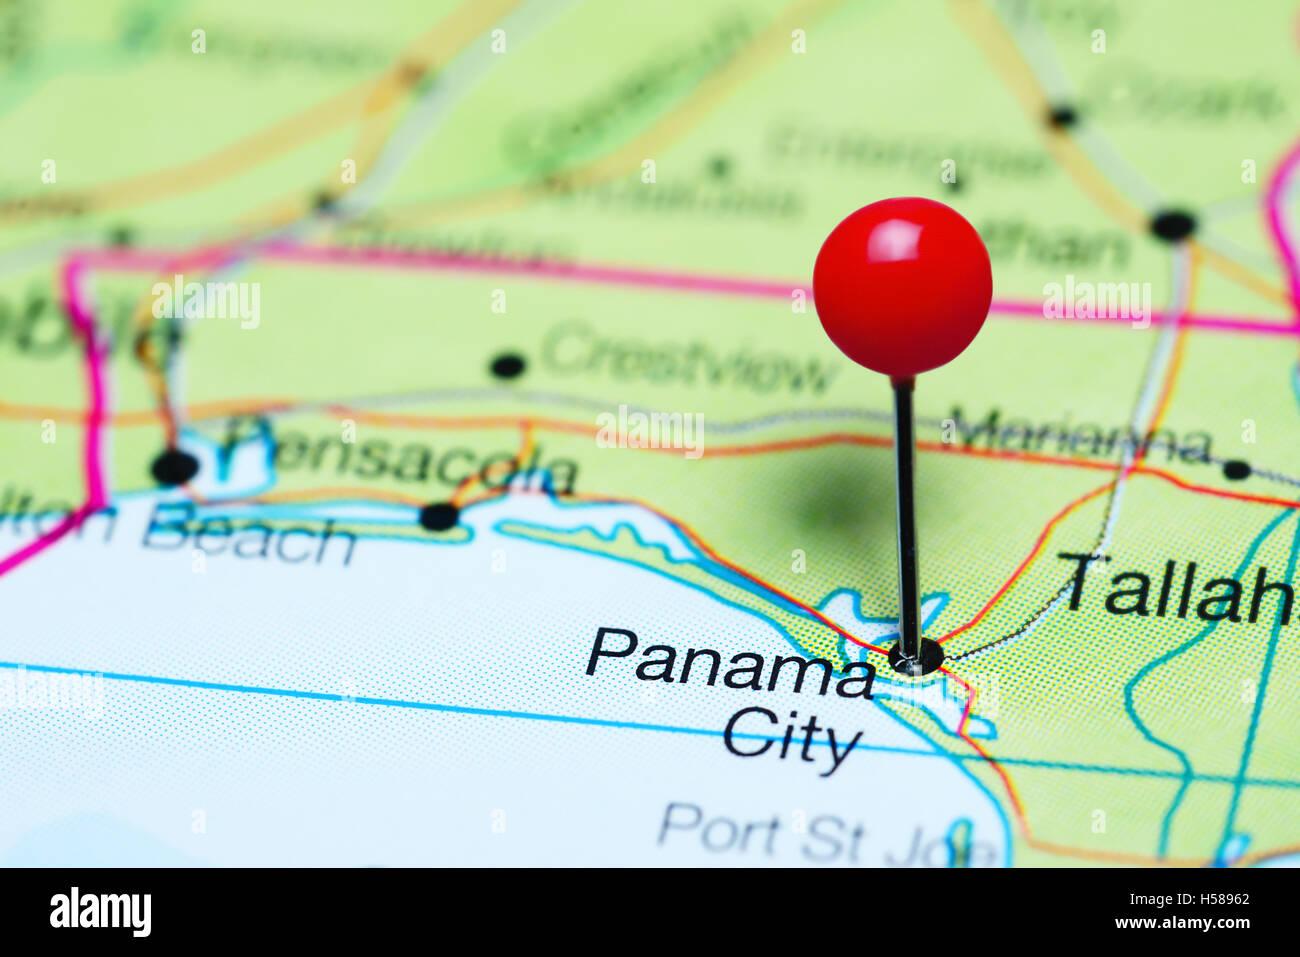 Panama City pinned on a map of Florida, USA Stock Photo: 123728698 ...